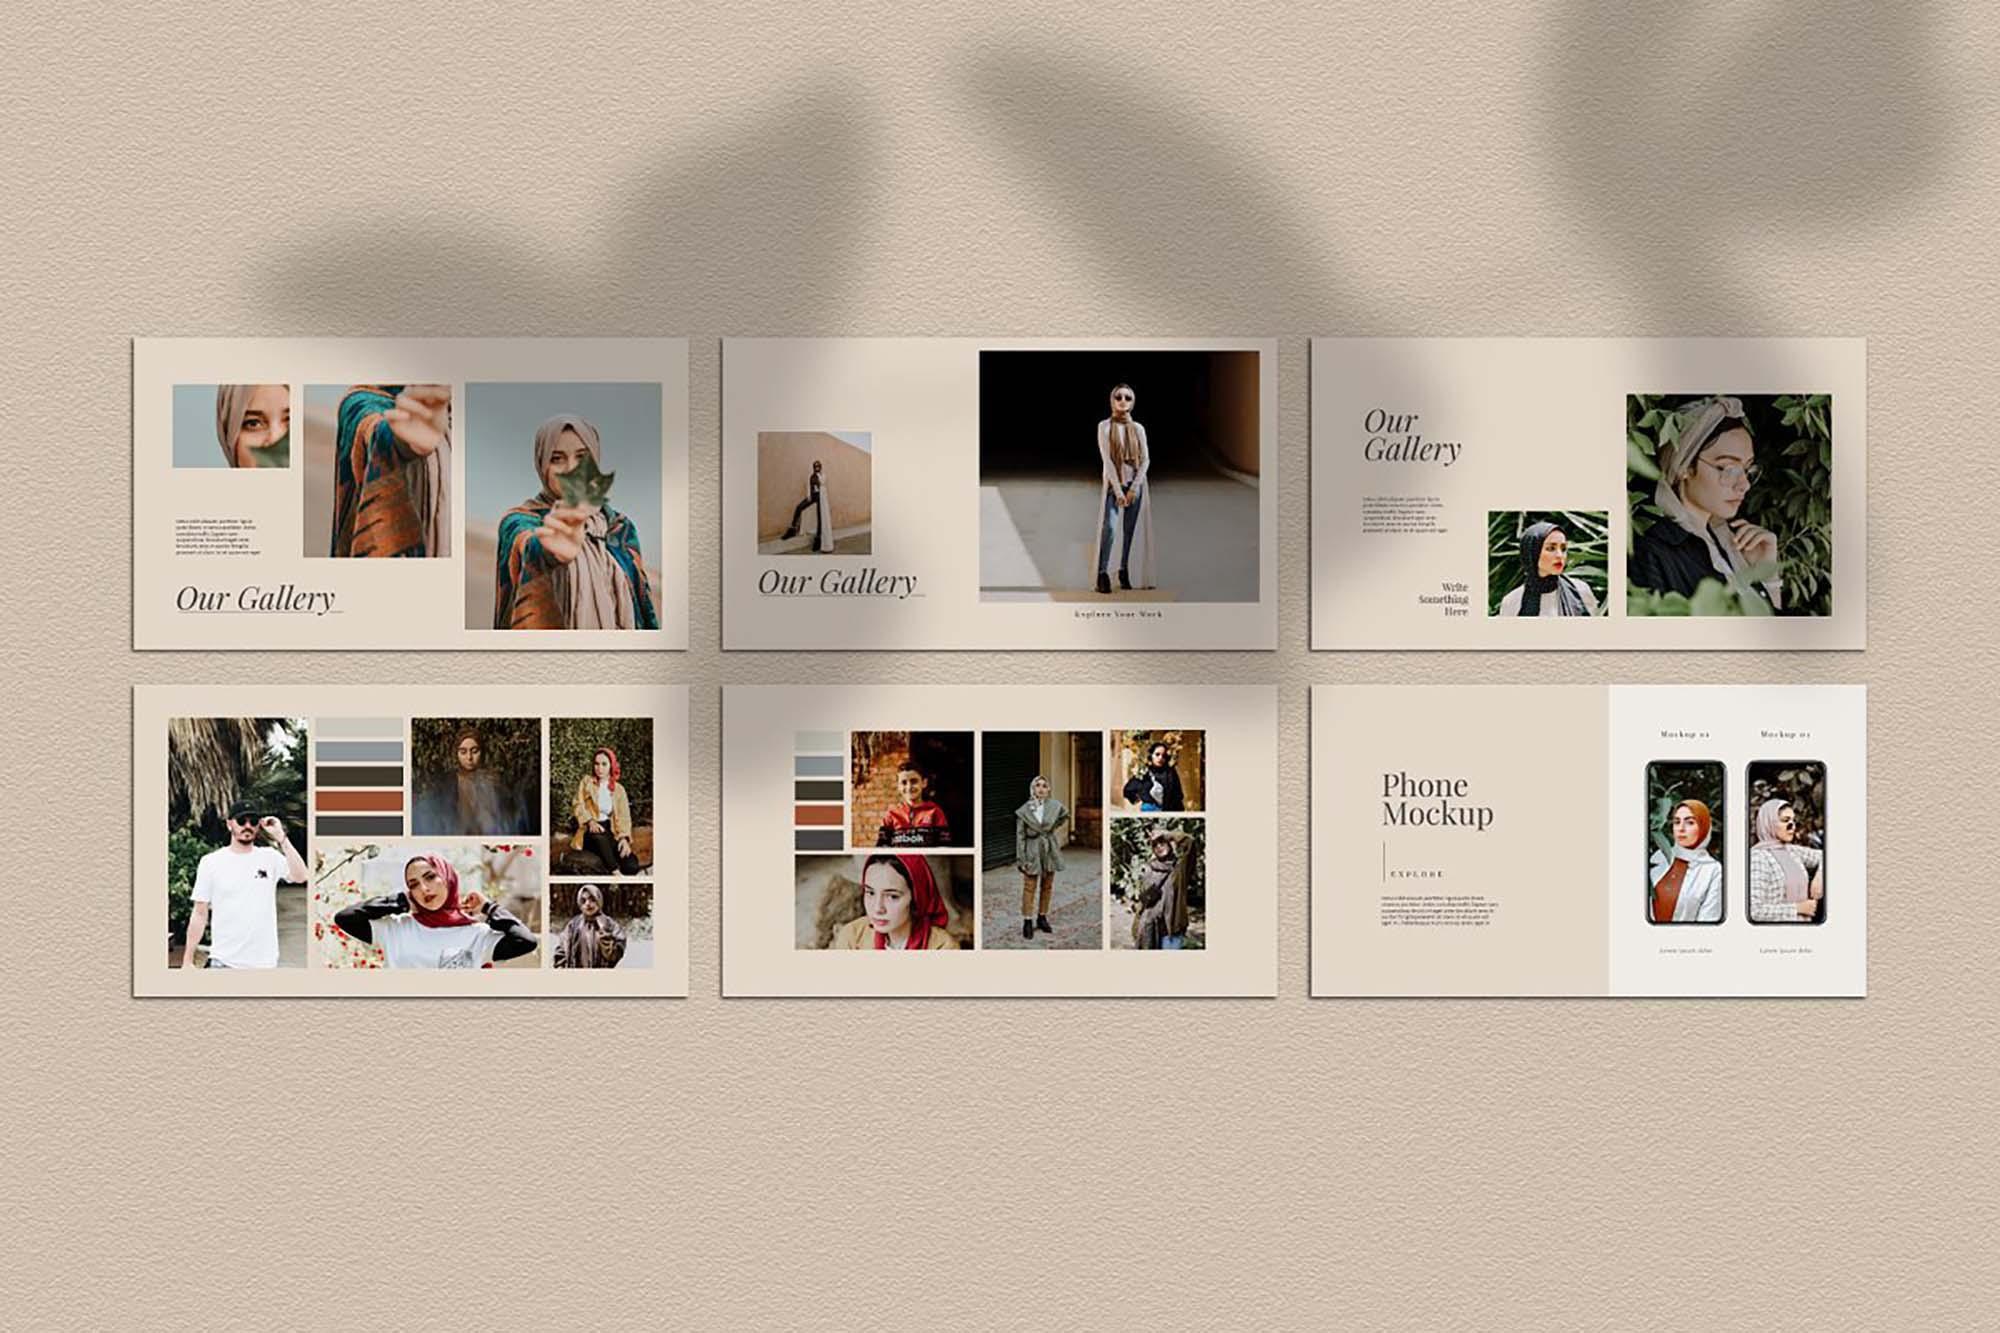 Golden Lookbook Fashion Powerpoint 6